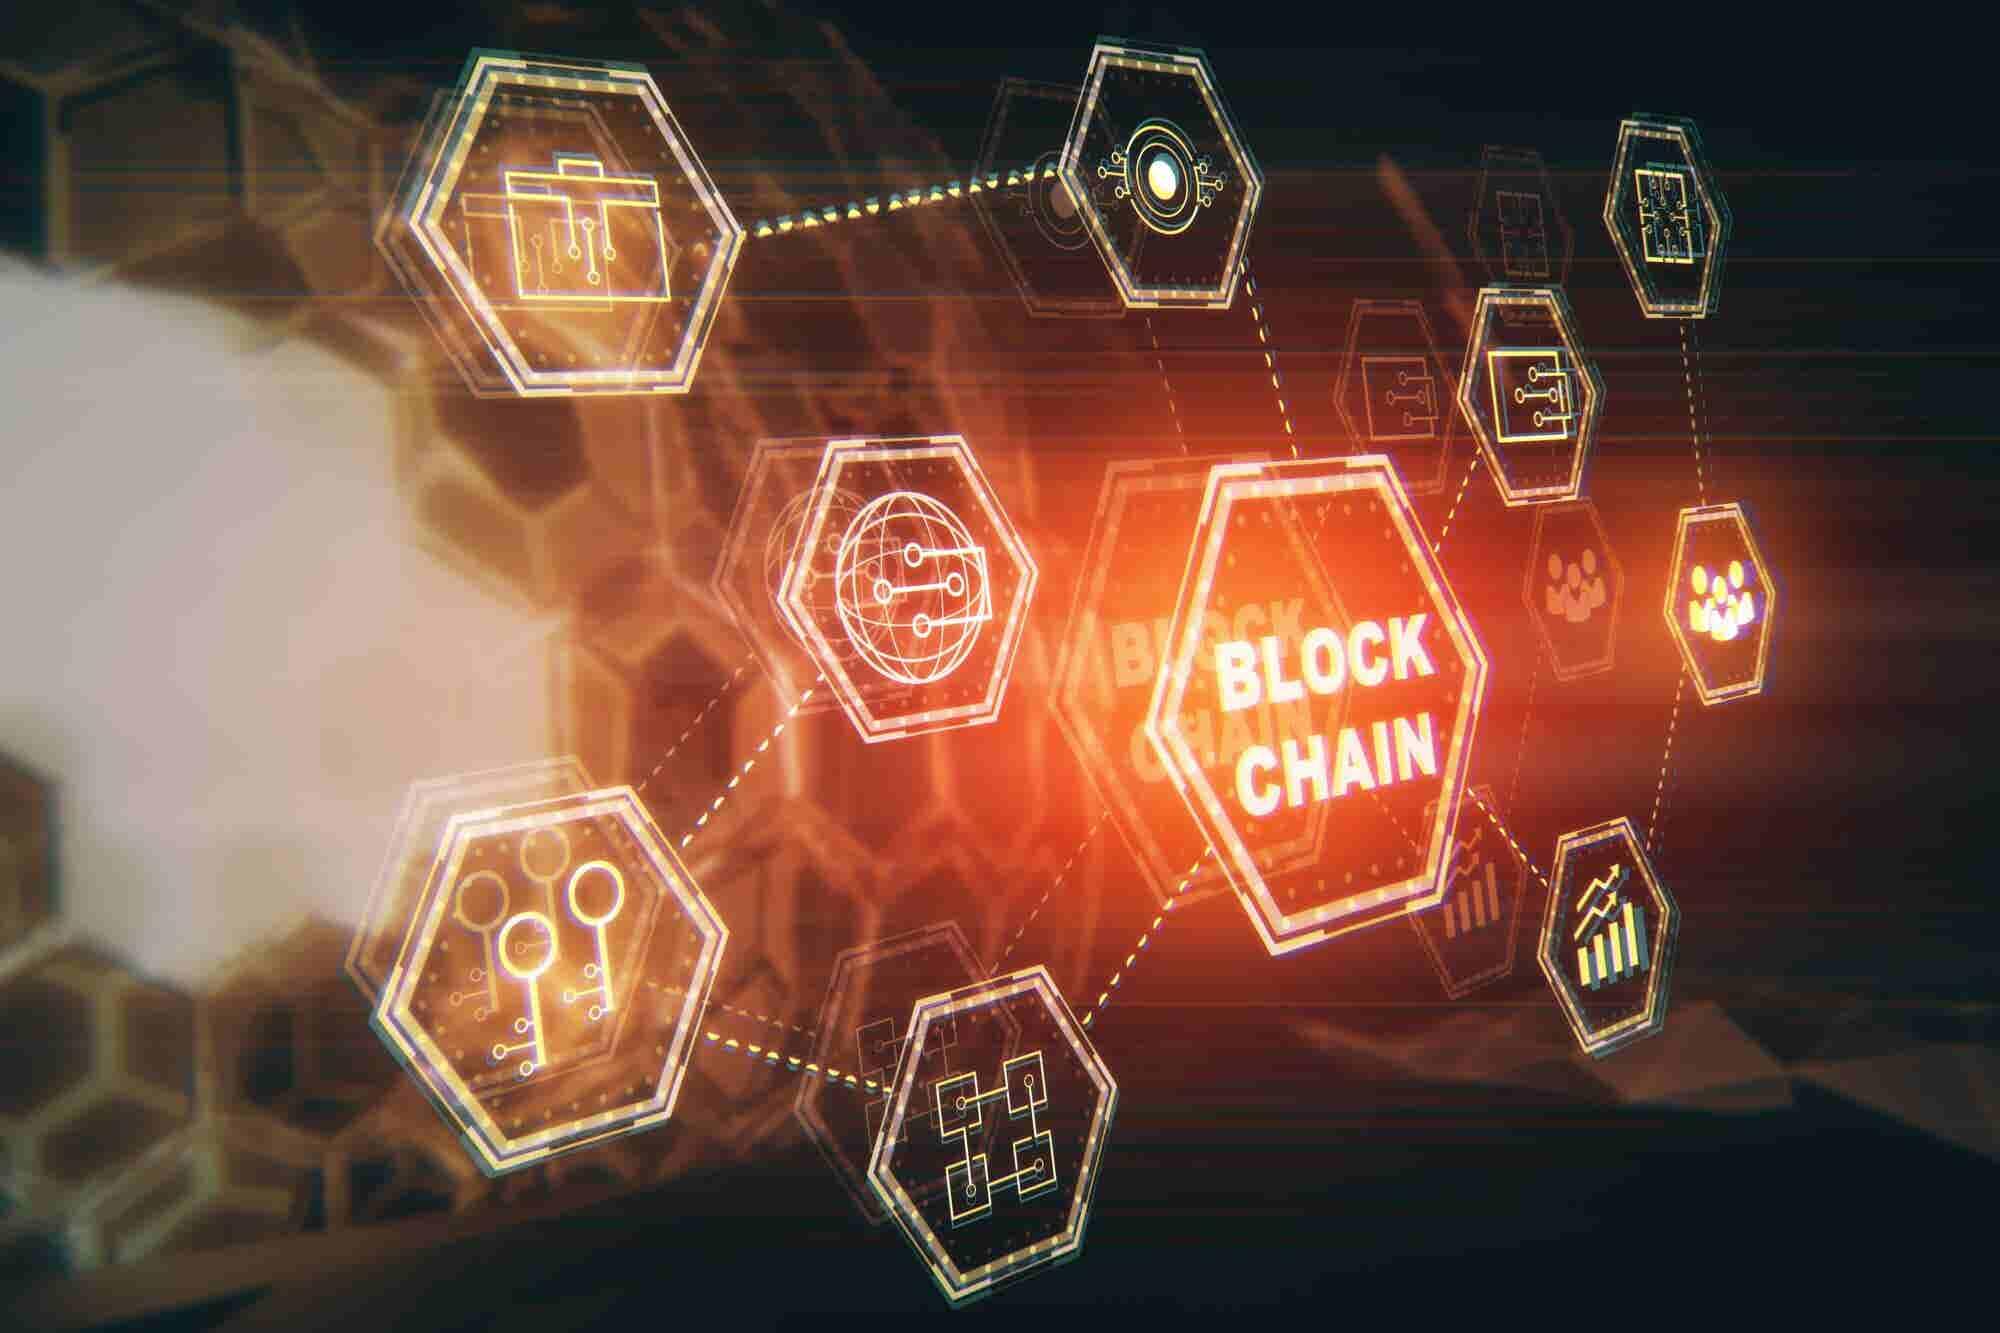 Don't Let Blockchain Technology's Security Loopholes Go Unnoticed